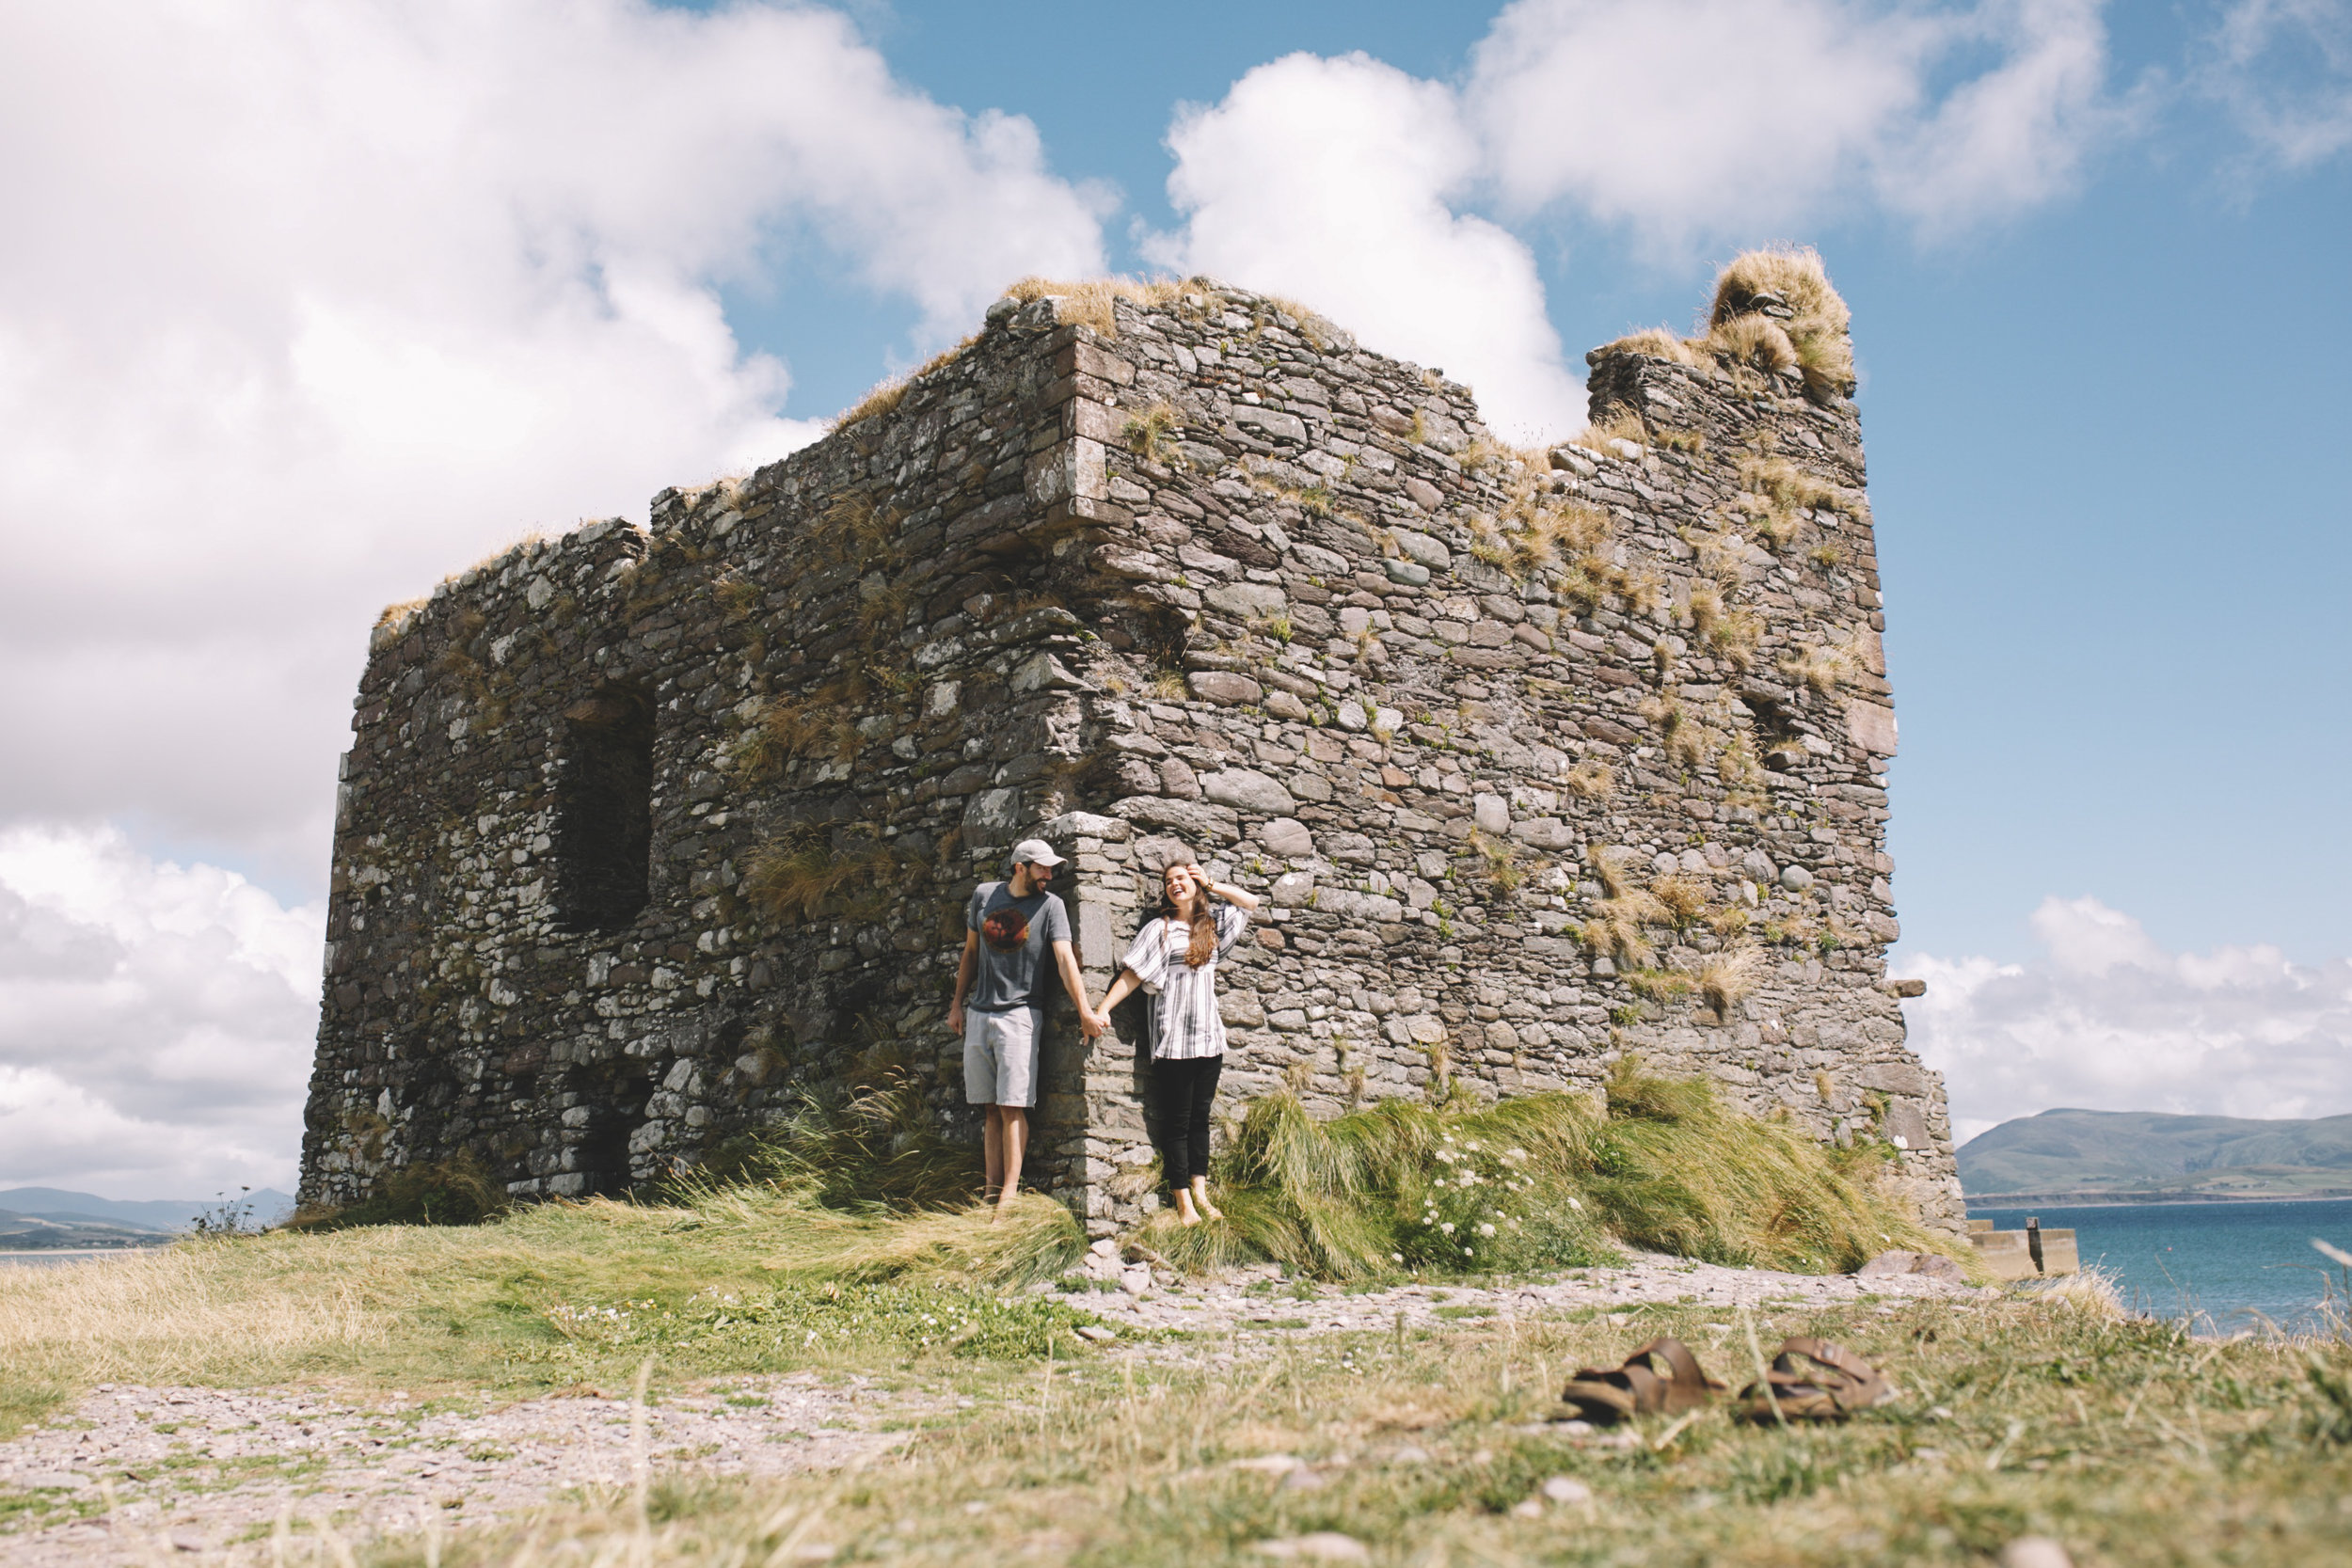 10 Tear Anniversary Trip - Ballinskelligs Ireland  (55 of 101).jpg